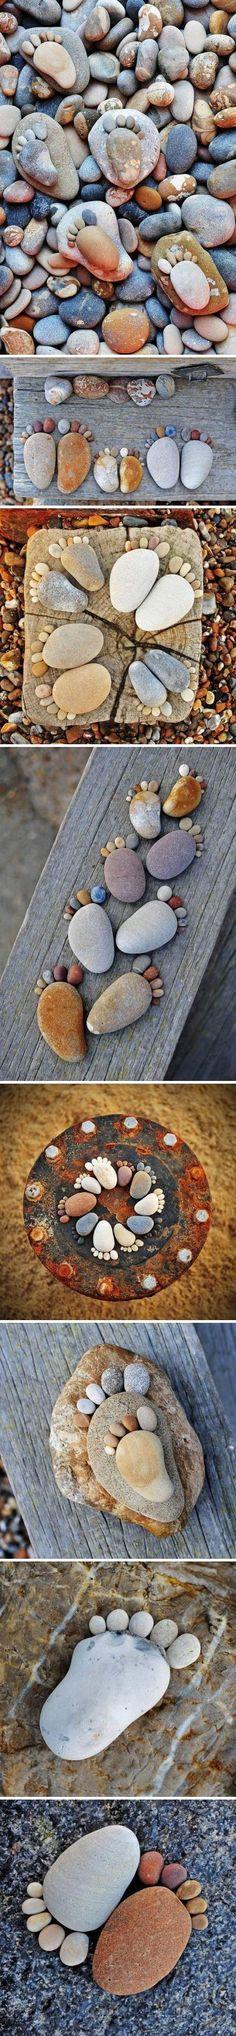 footprint camping craft